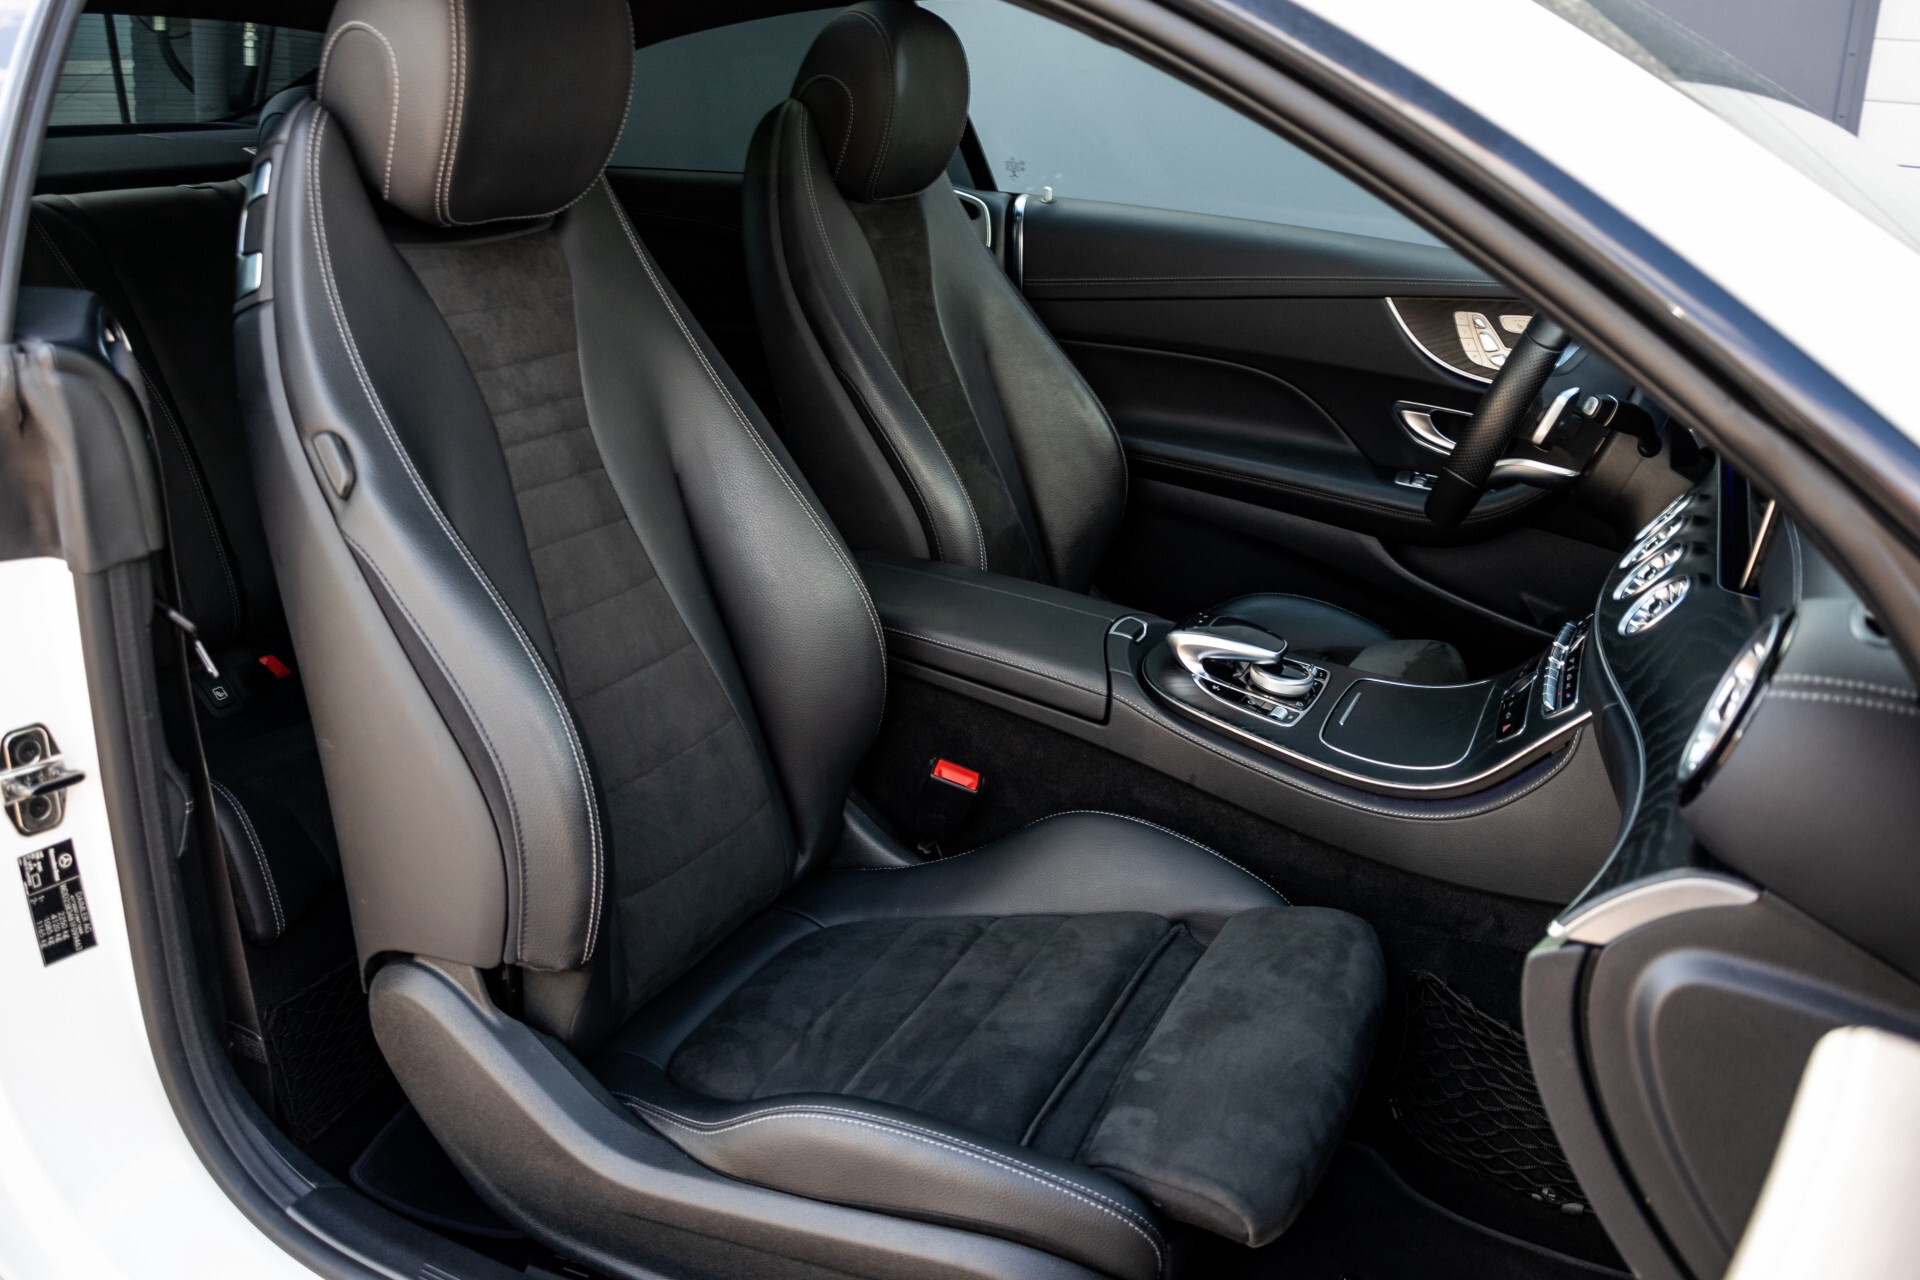 Mercedes-Benz E-Klasse Coupé 300 AMG Panorama/Rij-assist/Keyless/Massage/Memory/HUD/Standkachel/Night Aut9 Foto 7